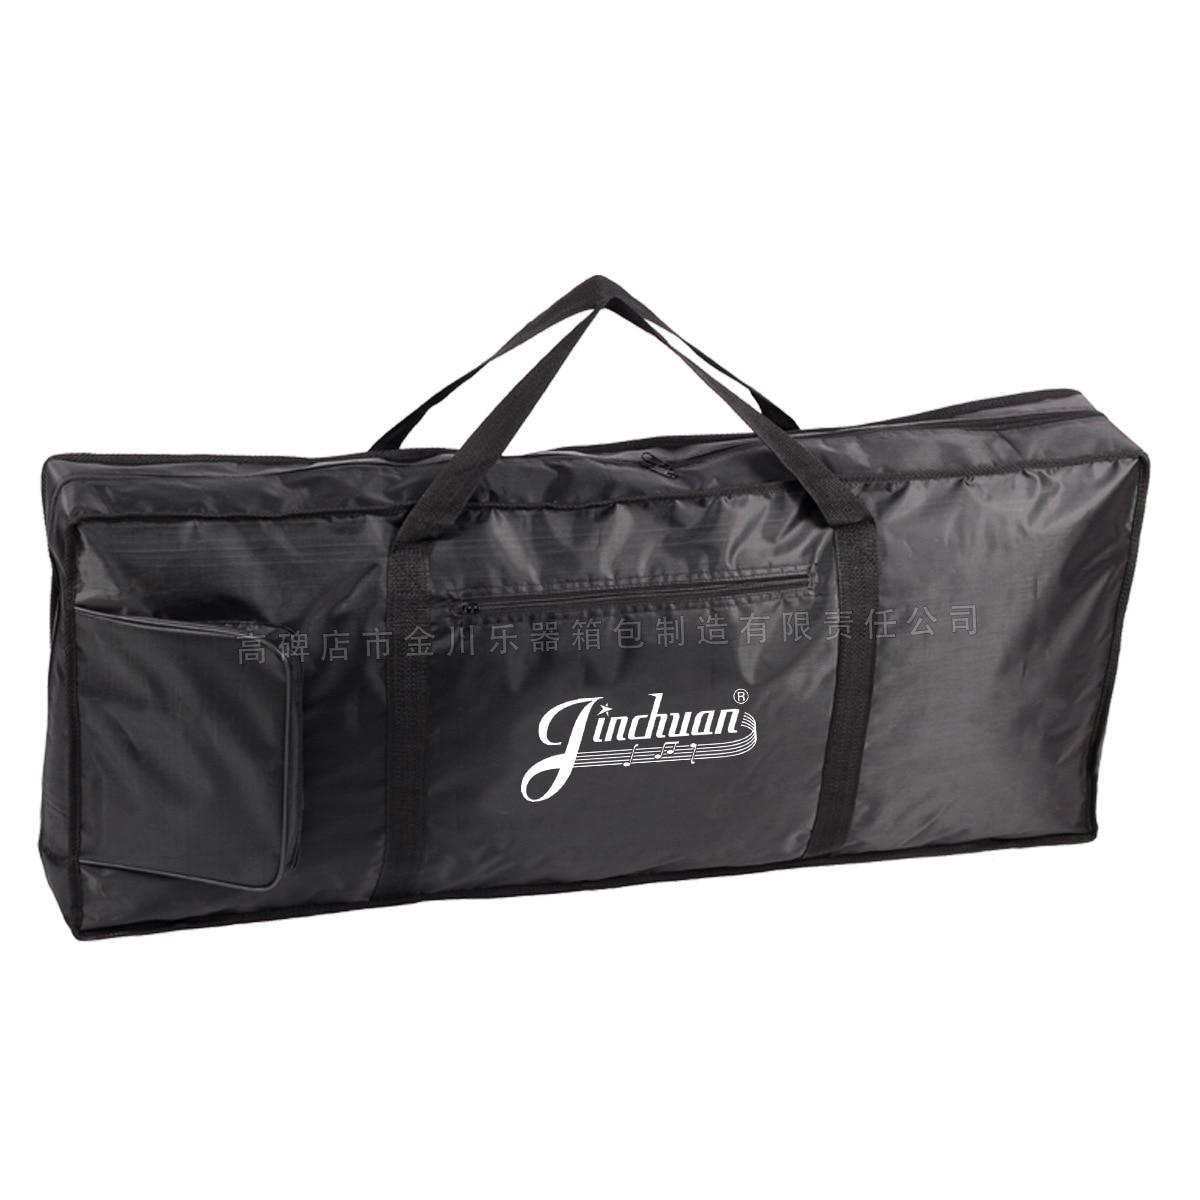 61 key general universal keyboard bag package electronic piano bag waterproof electronic organ bag Instrument Bags